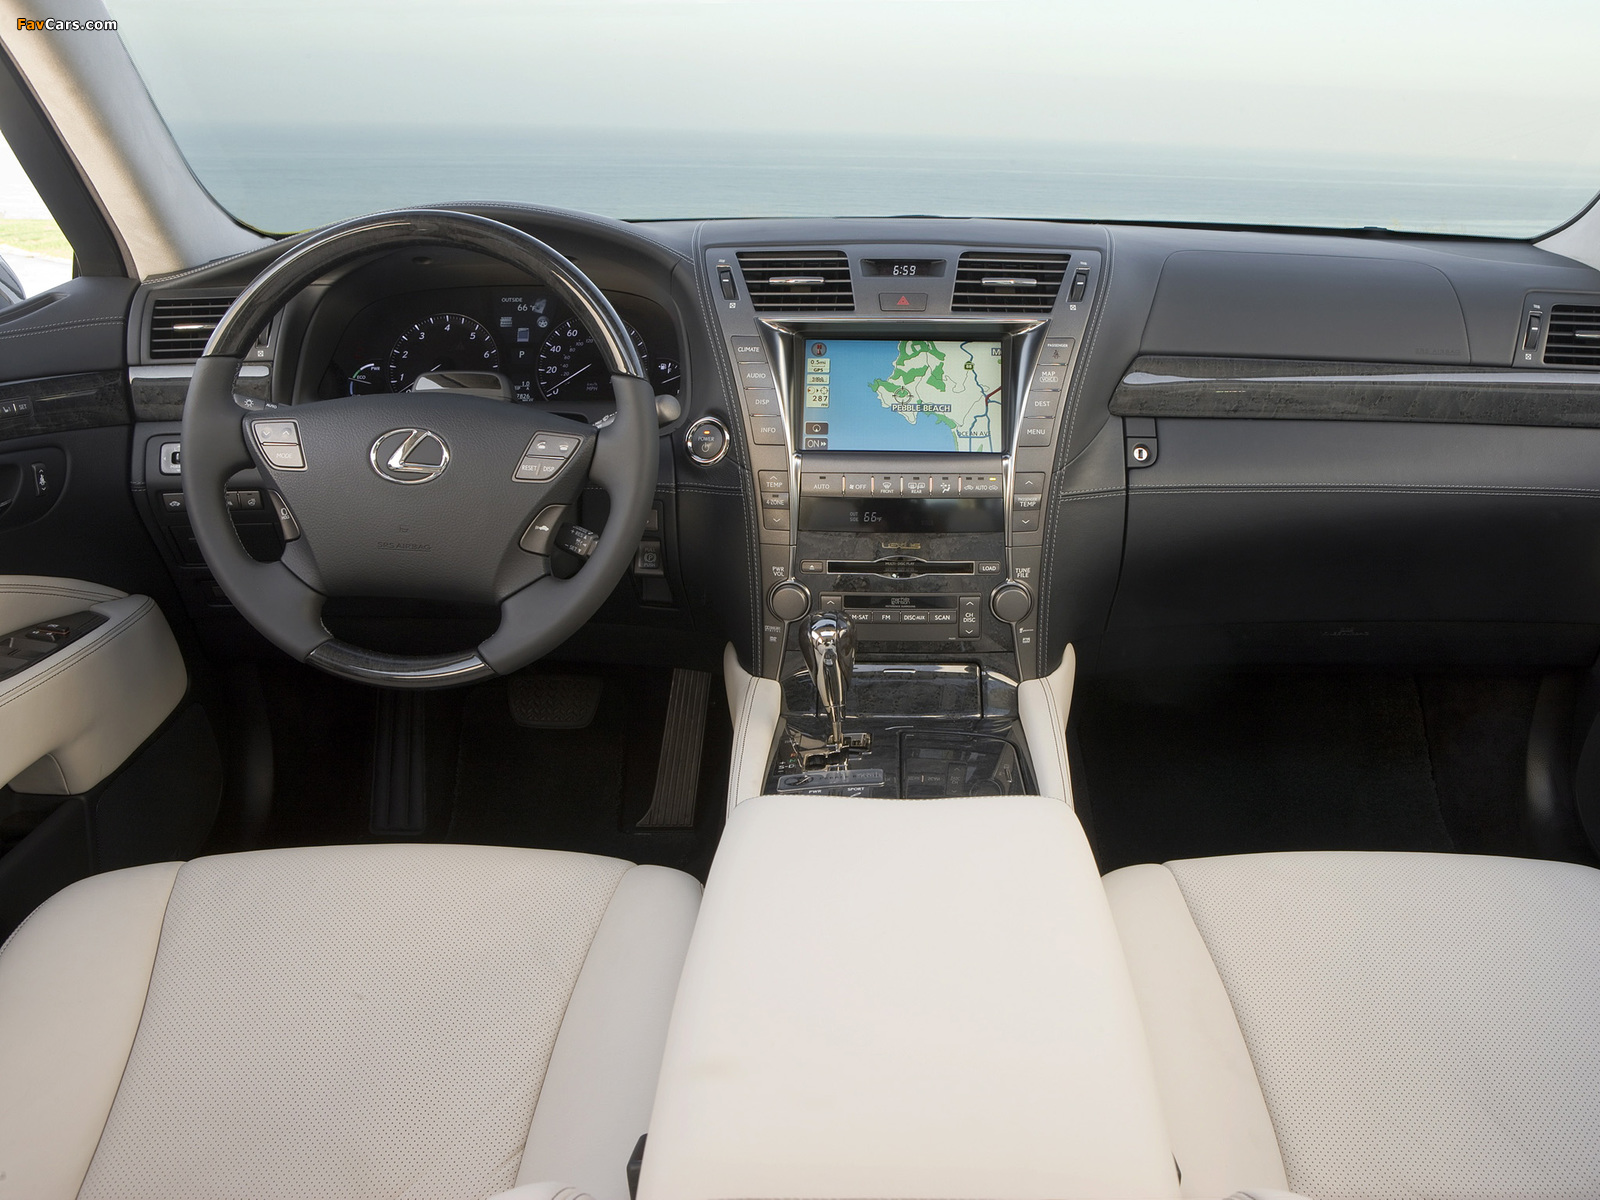 Lexus LS 600h L Pebble Beach Edition (UVF45) 2008 pictures (1600 x 1200)